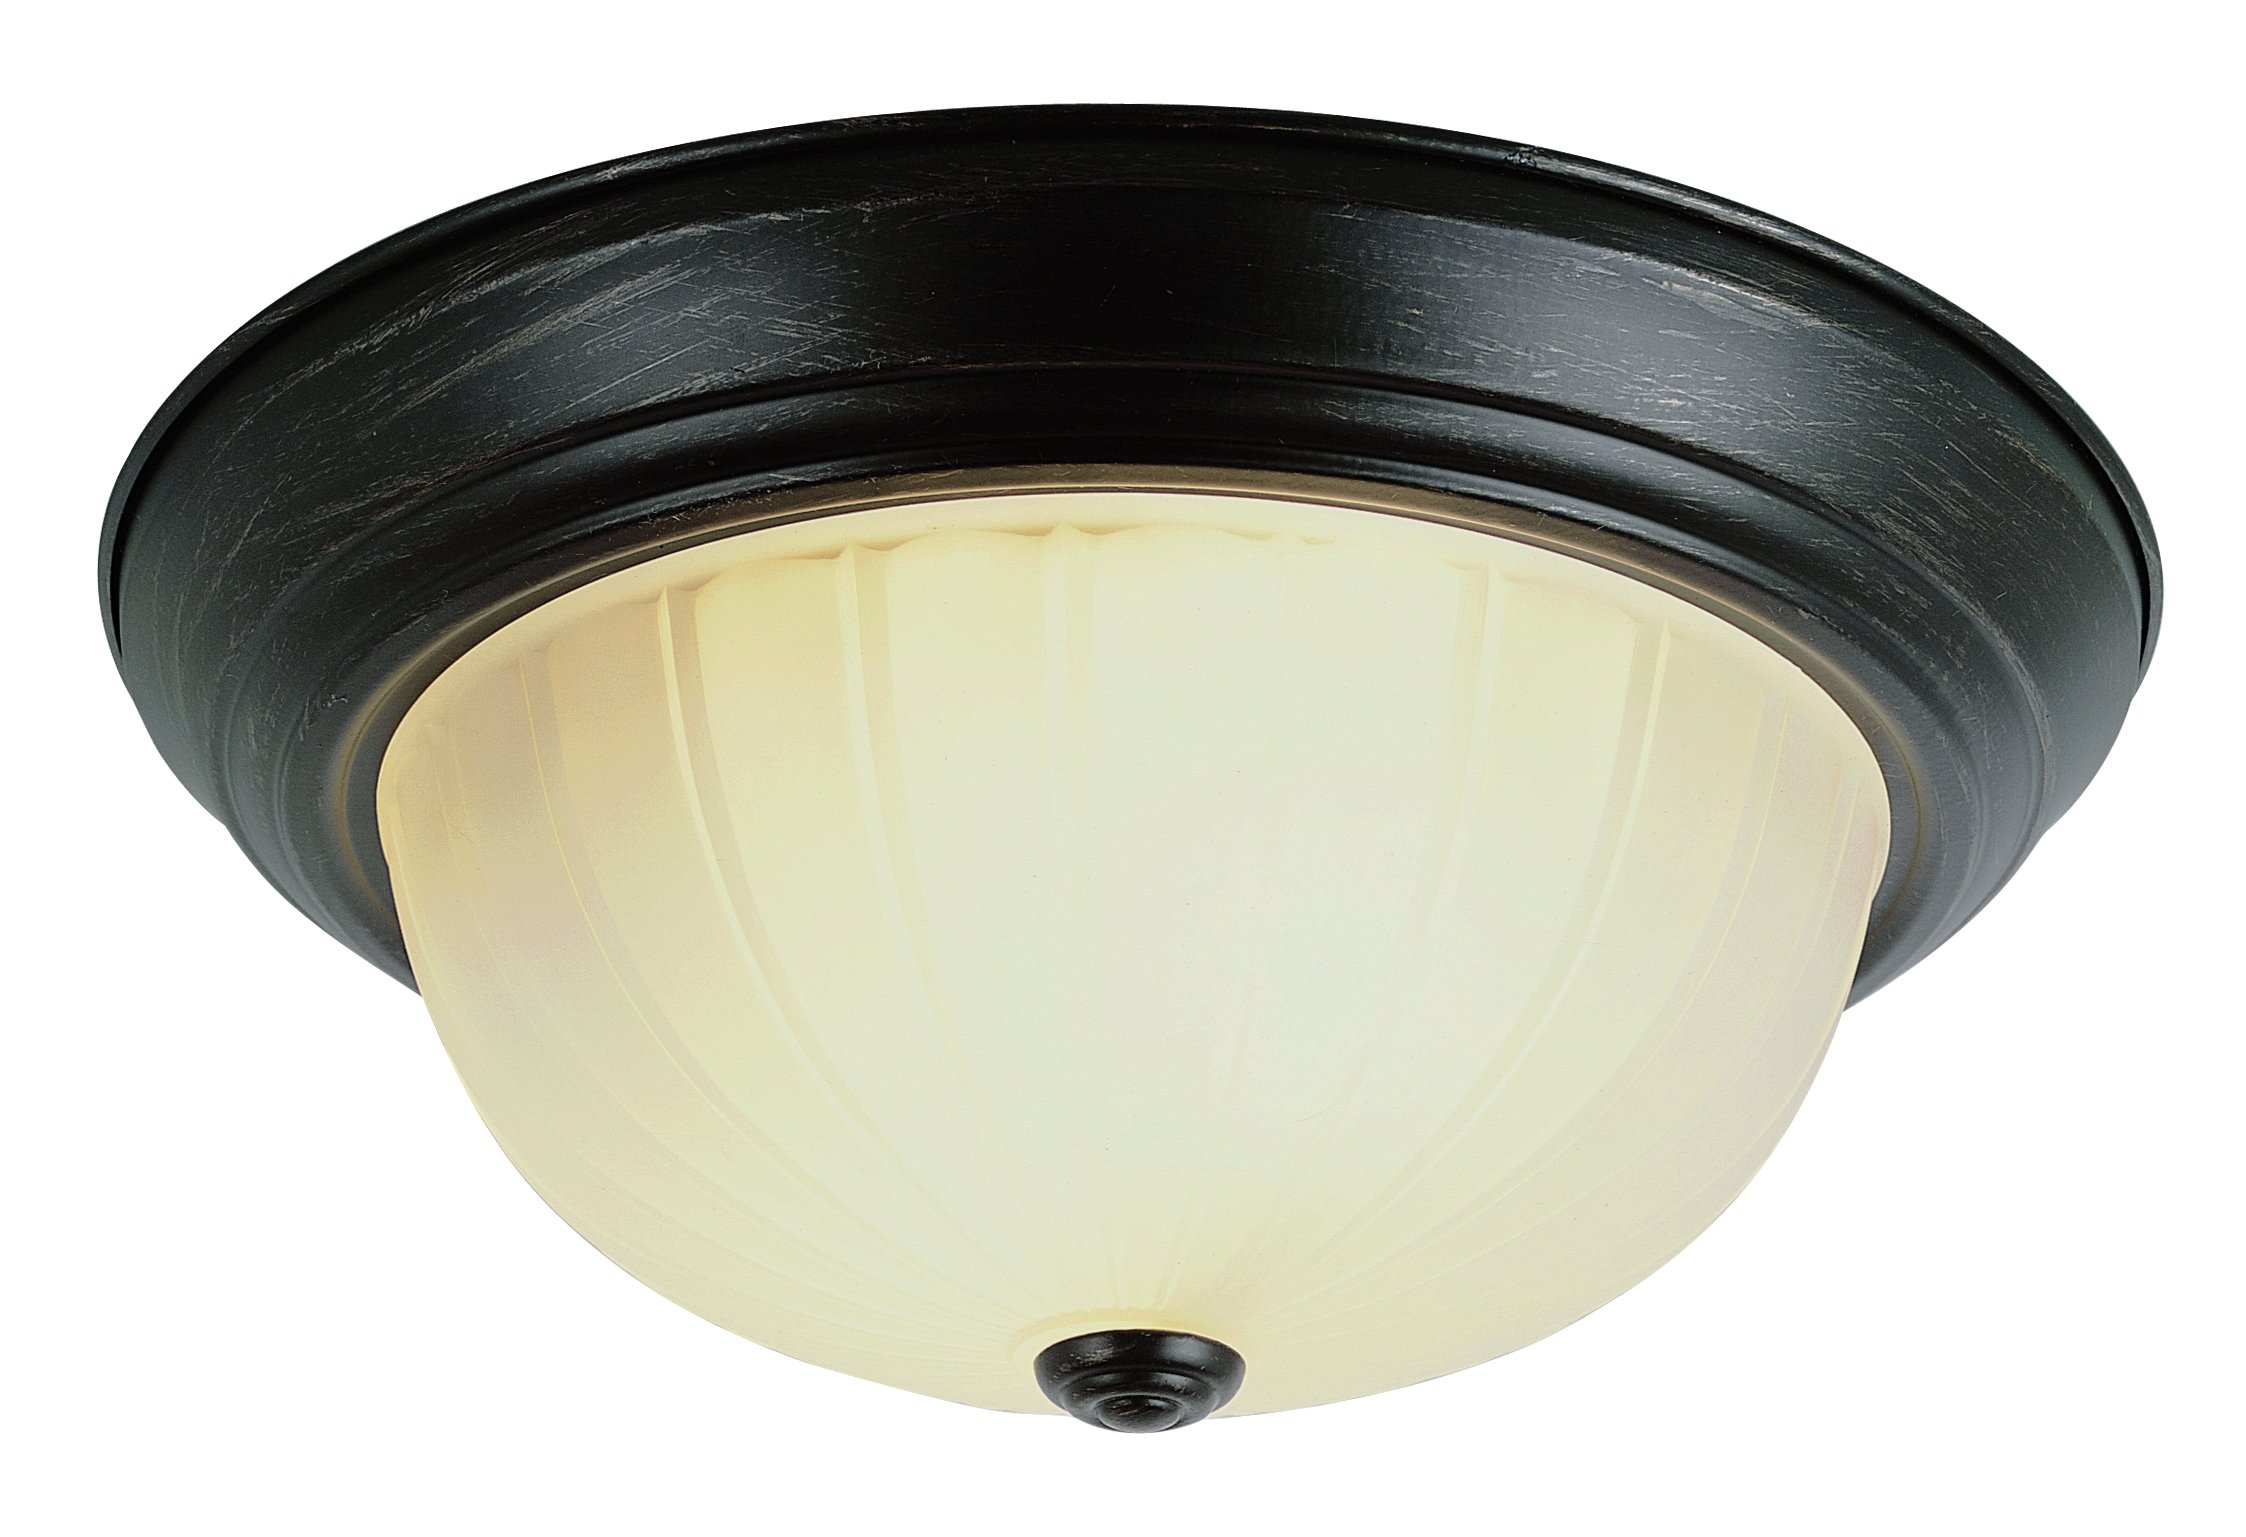 Trans Globe Lighting 13215-1 ROB Indoor Breakwater 15'' Flushmount, Rubbed Oil Bronze